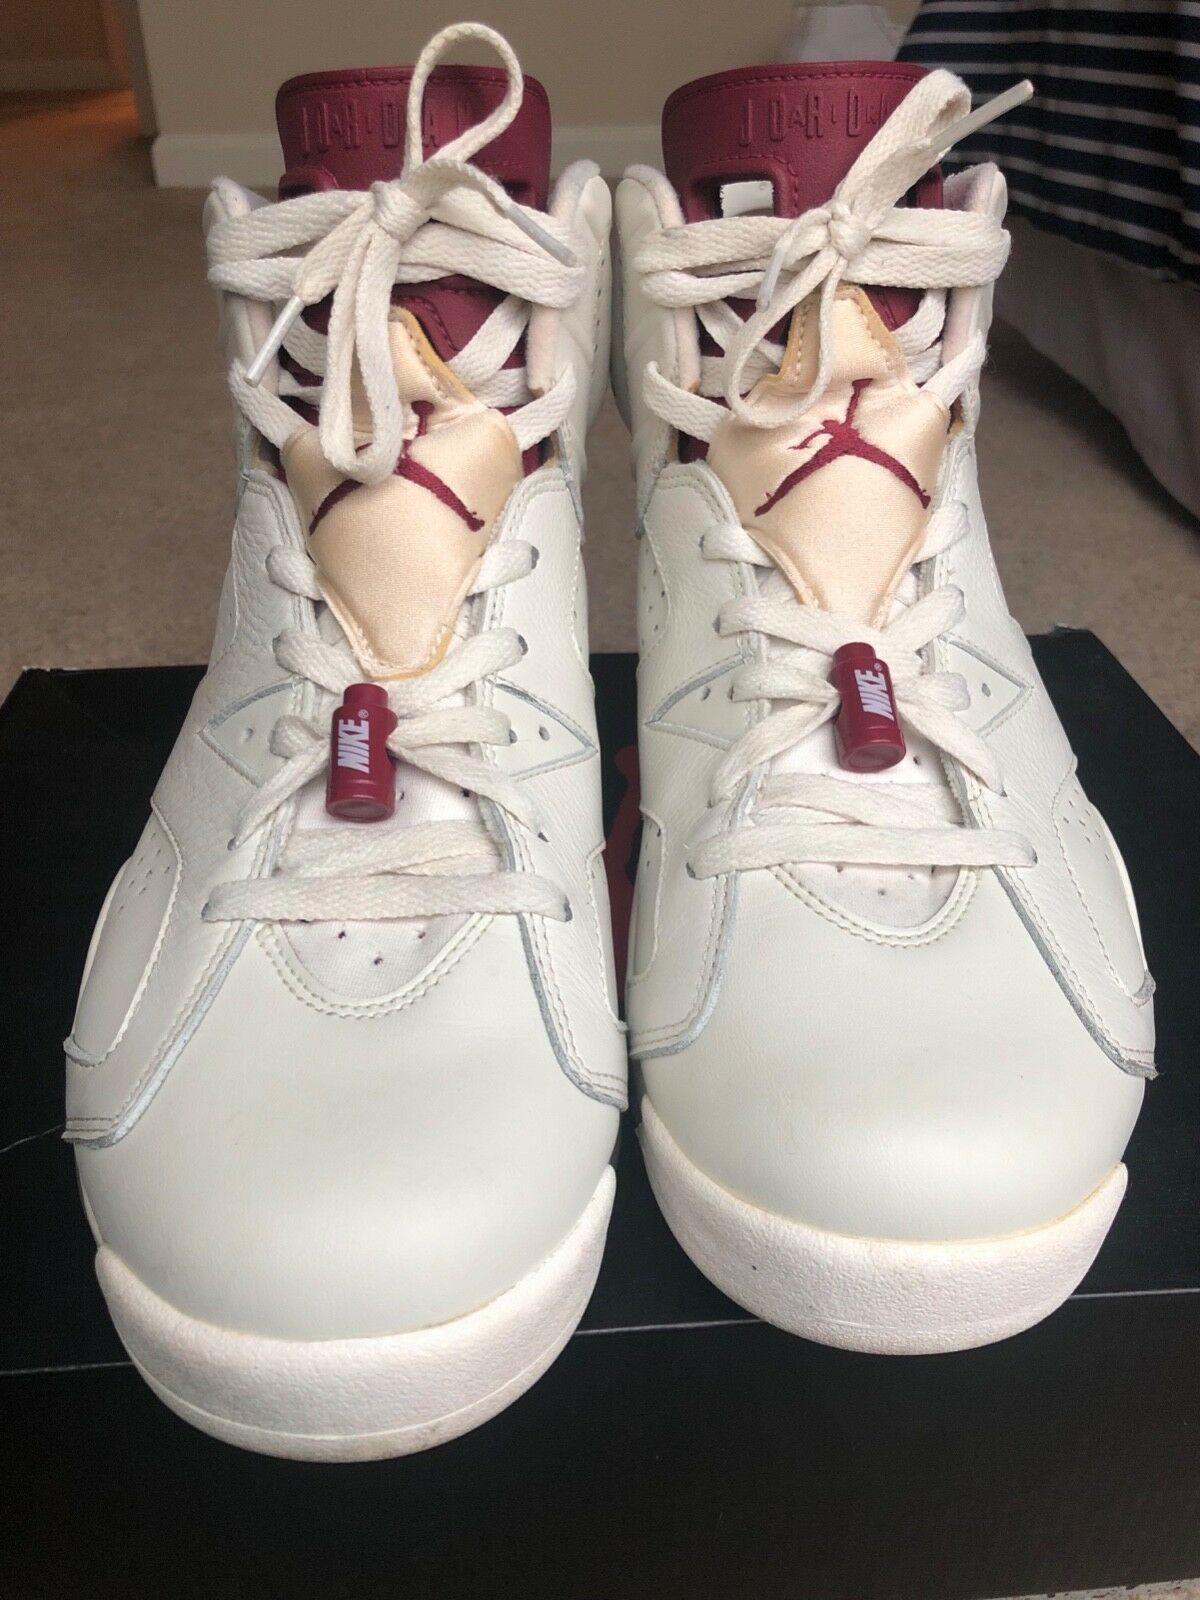 info for 9d5dd 2d5cf Nike Air Jordan 6 VI Retro Maroon Men s Size 10 2015